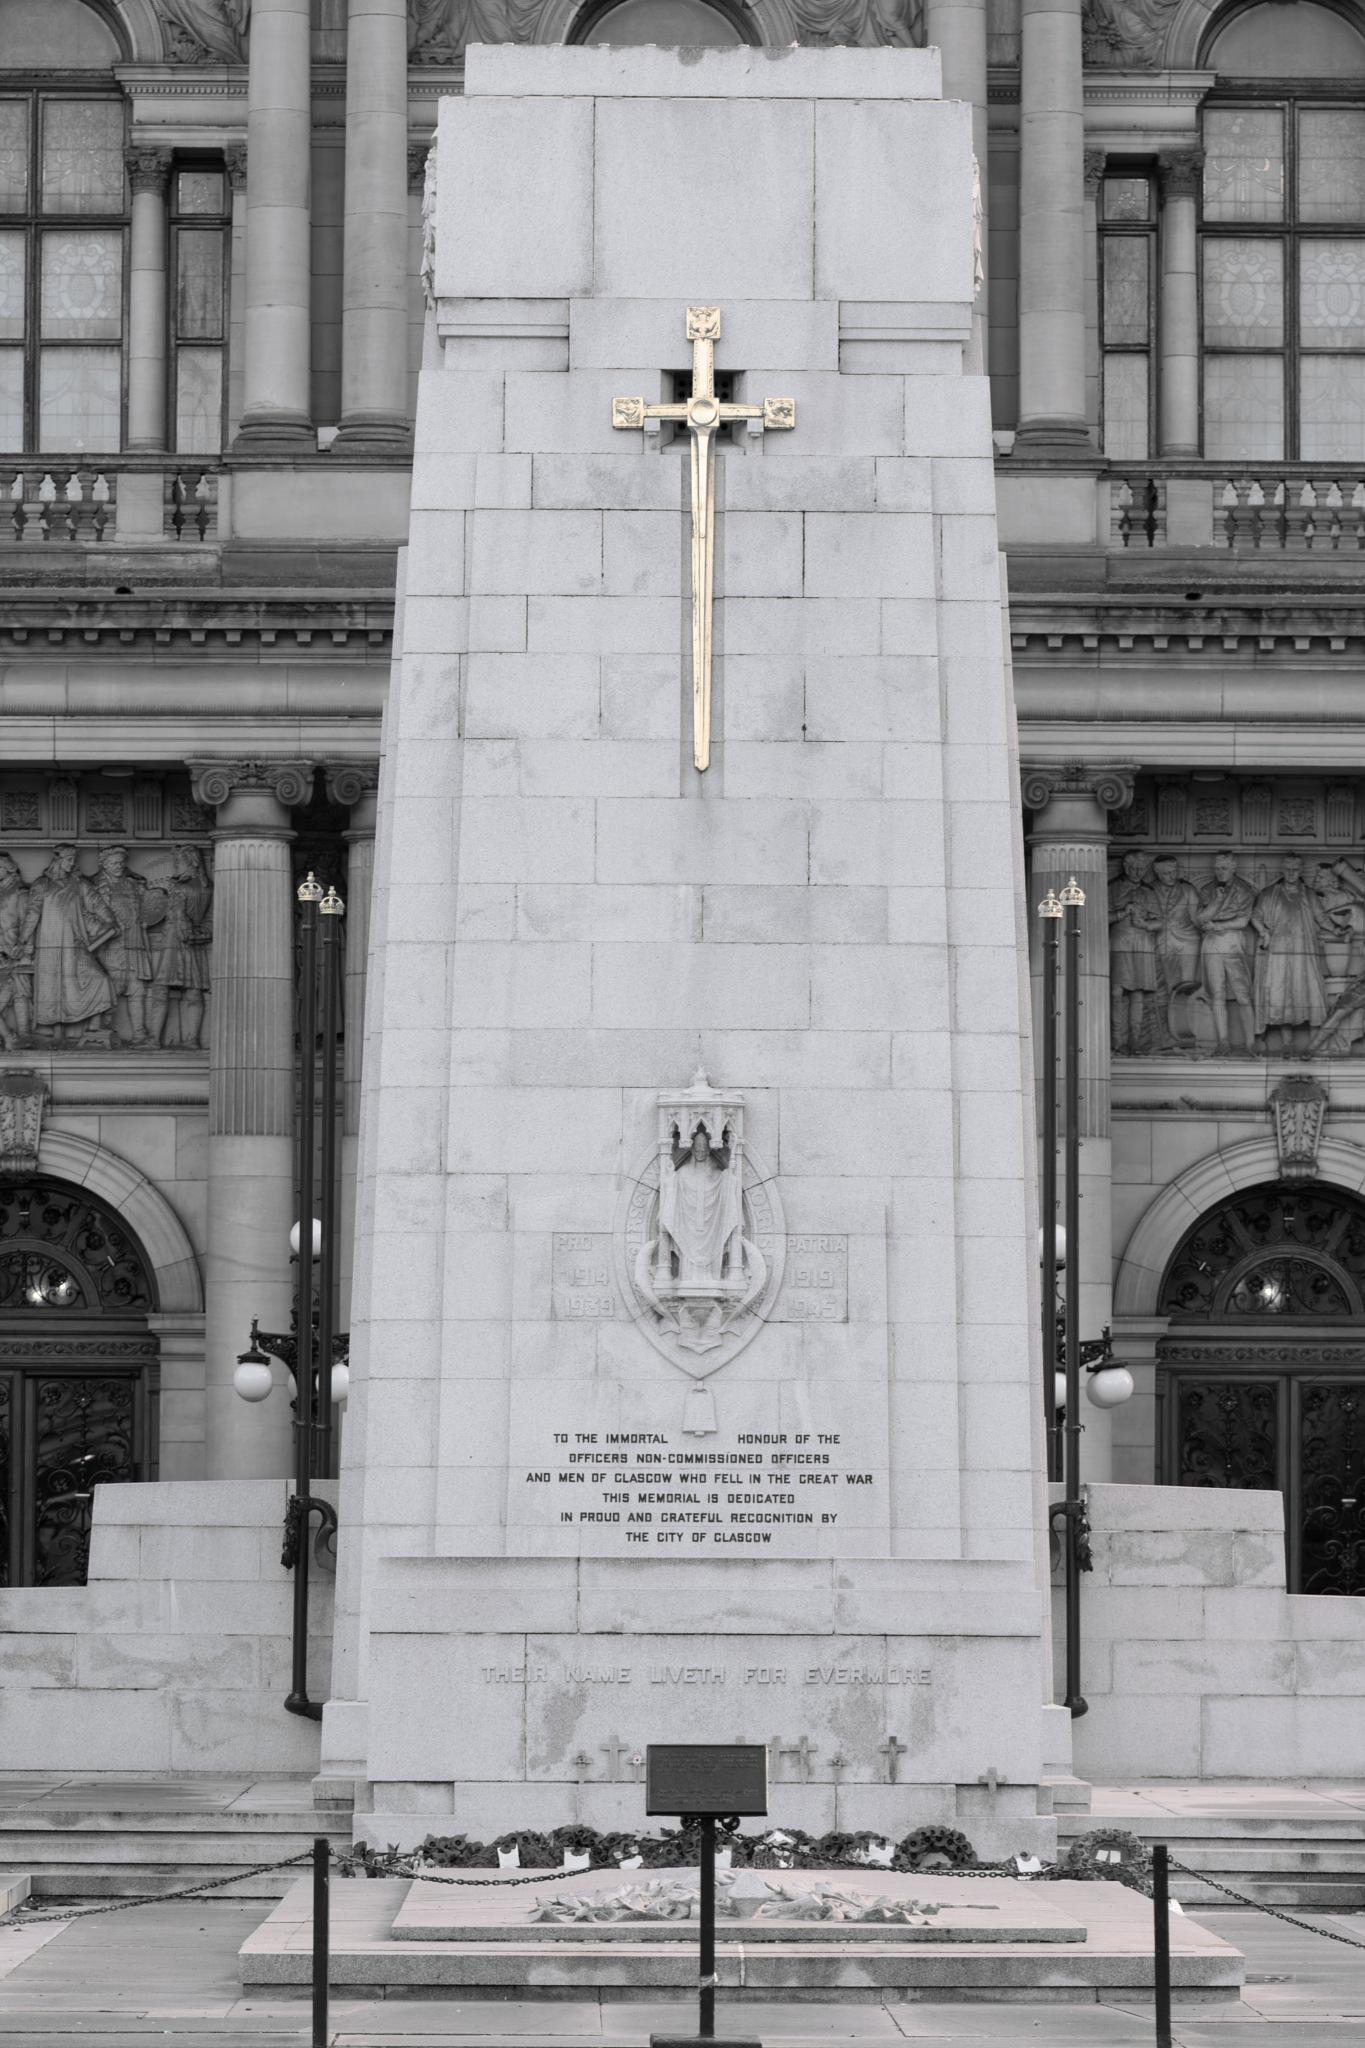 Glasgow war memorial by johnmcdougall